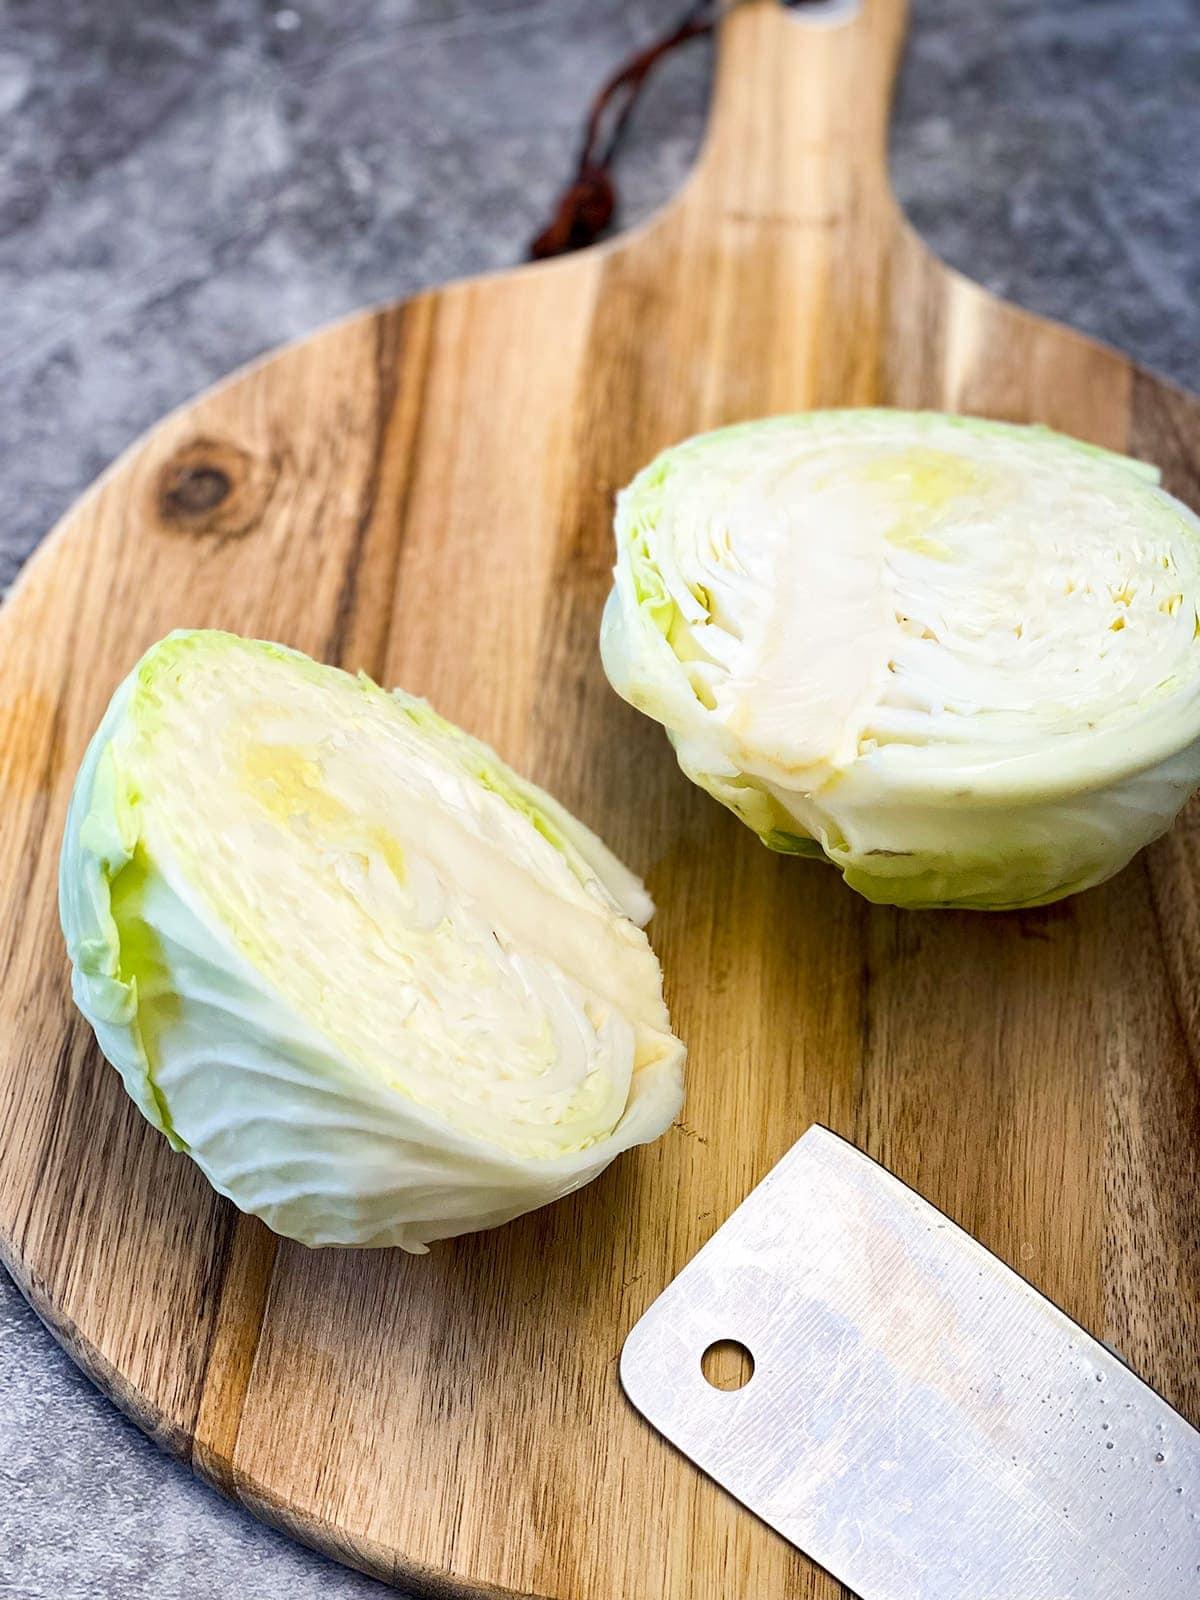 cut cabbage in half